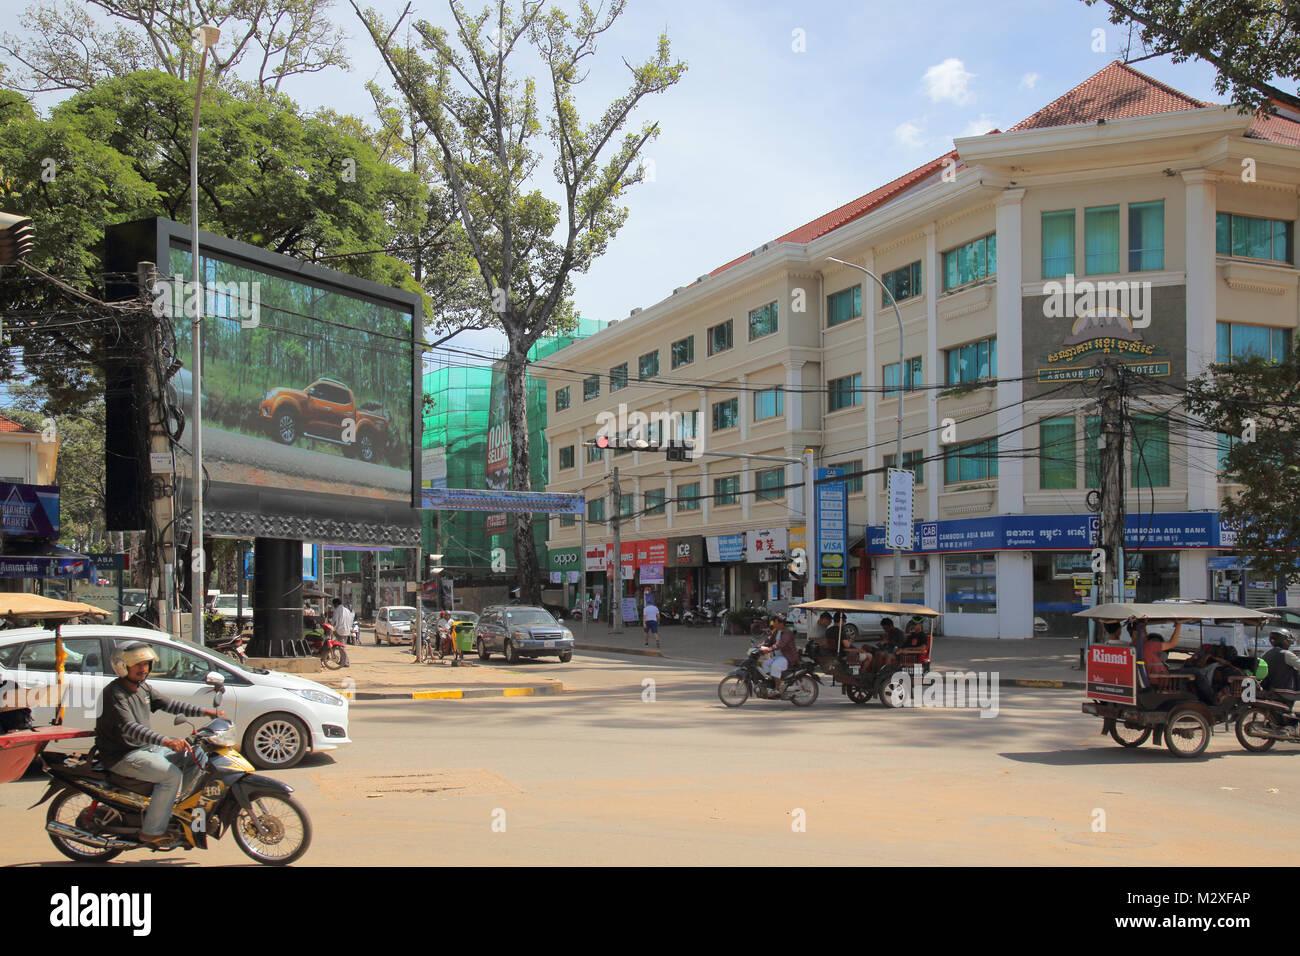 downtown siem reap cambodia Stock Photo